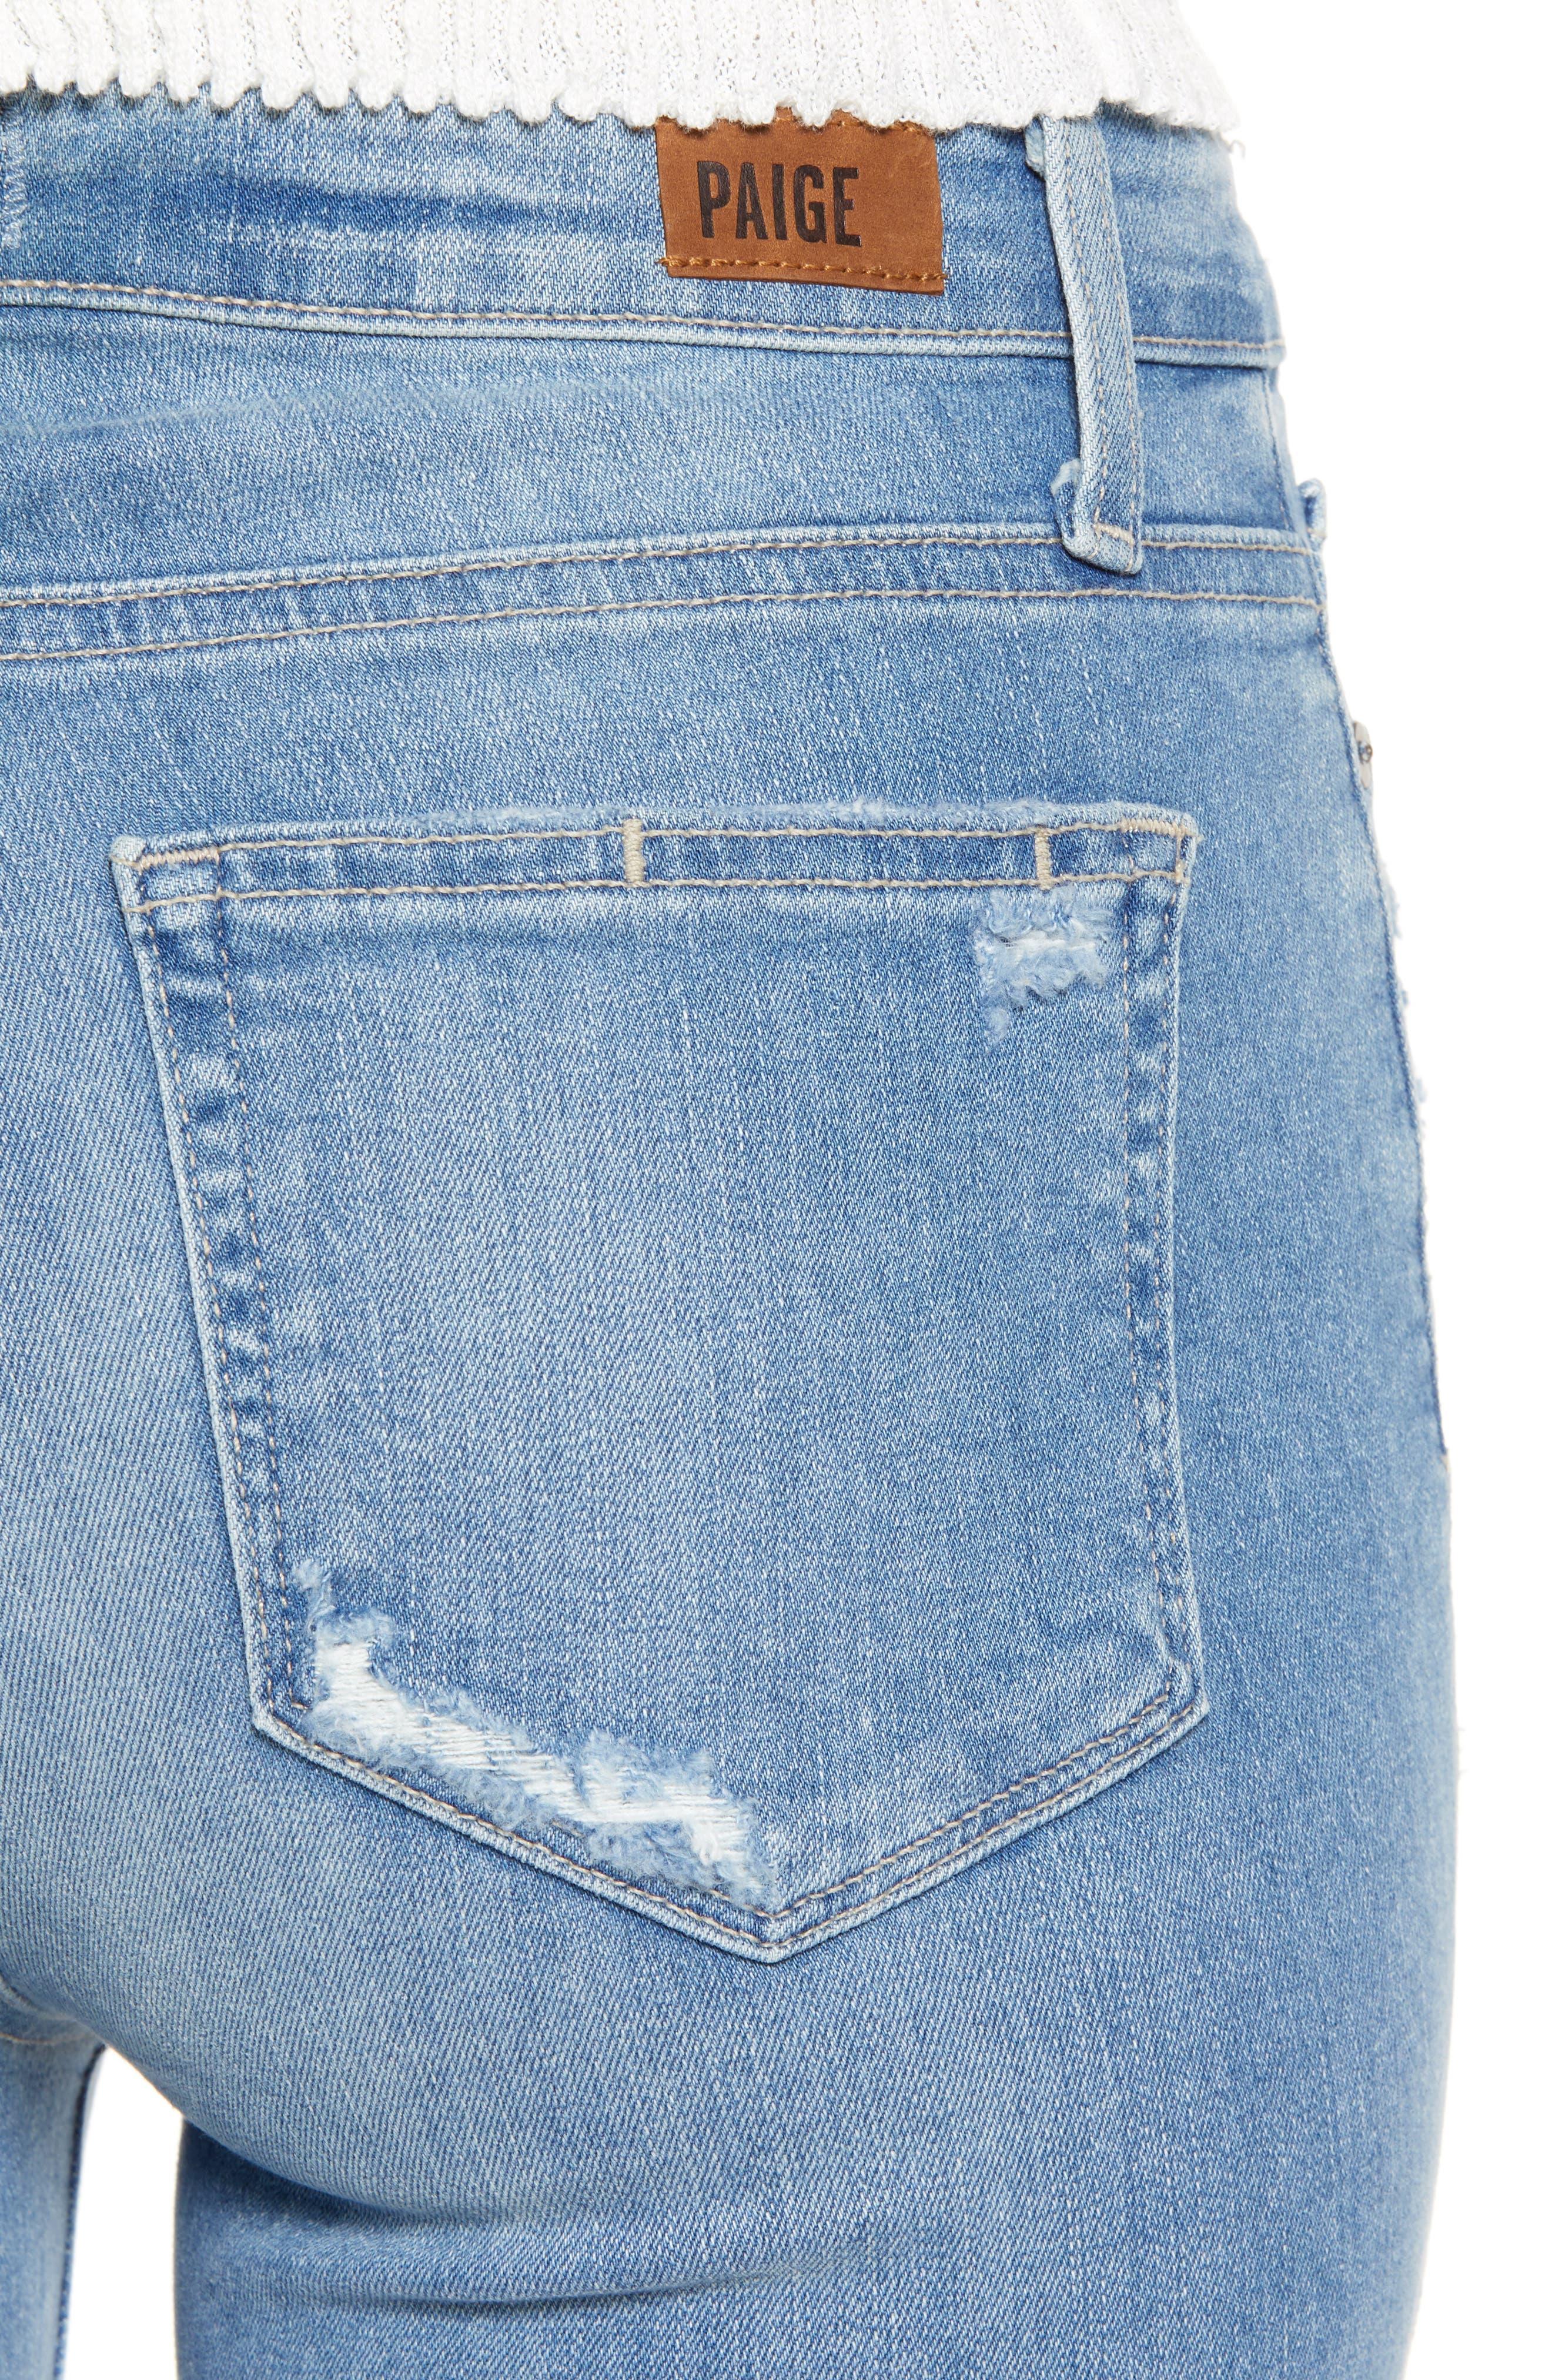 PAIGE, Hoxton Transcend Vintage High Waist Crop Skinny Jeans, Alternate thumbnail 5, color, ATTERBURY W/ TORN BACK HEM